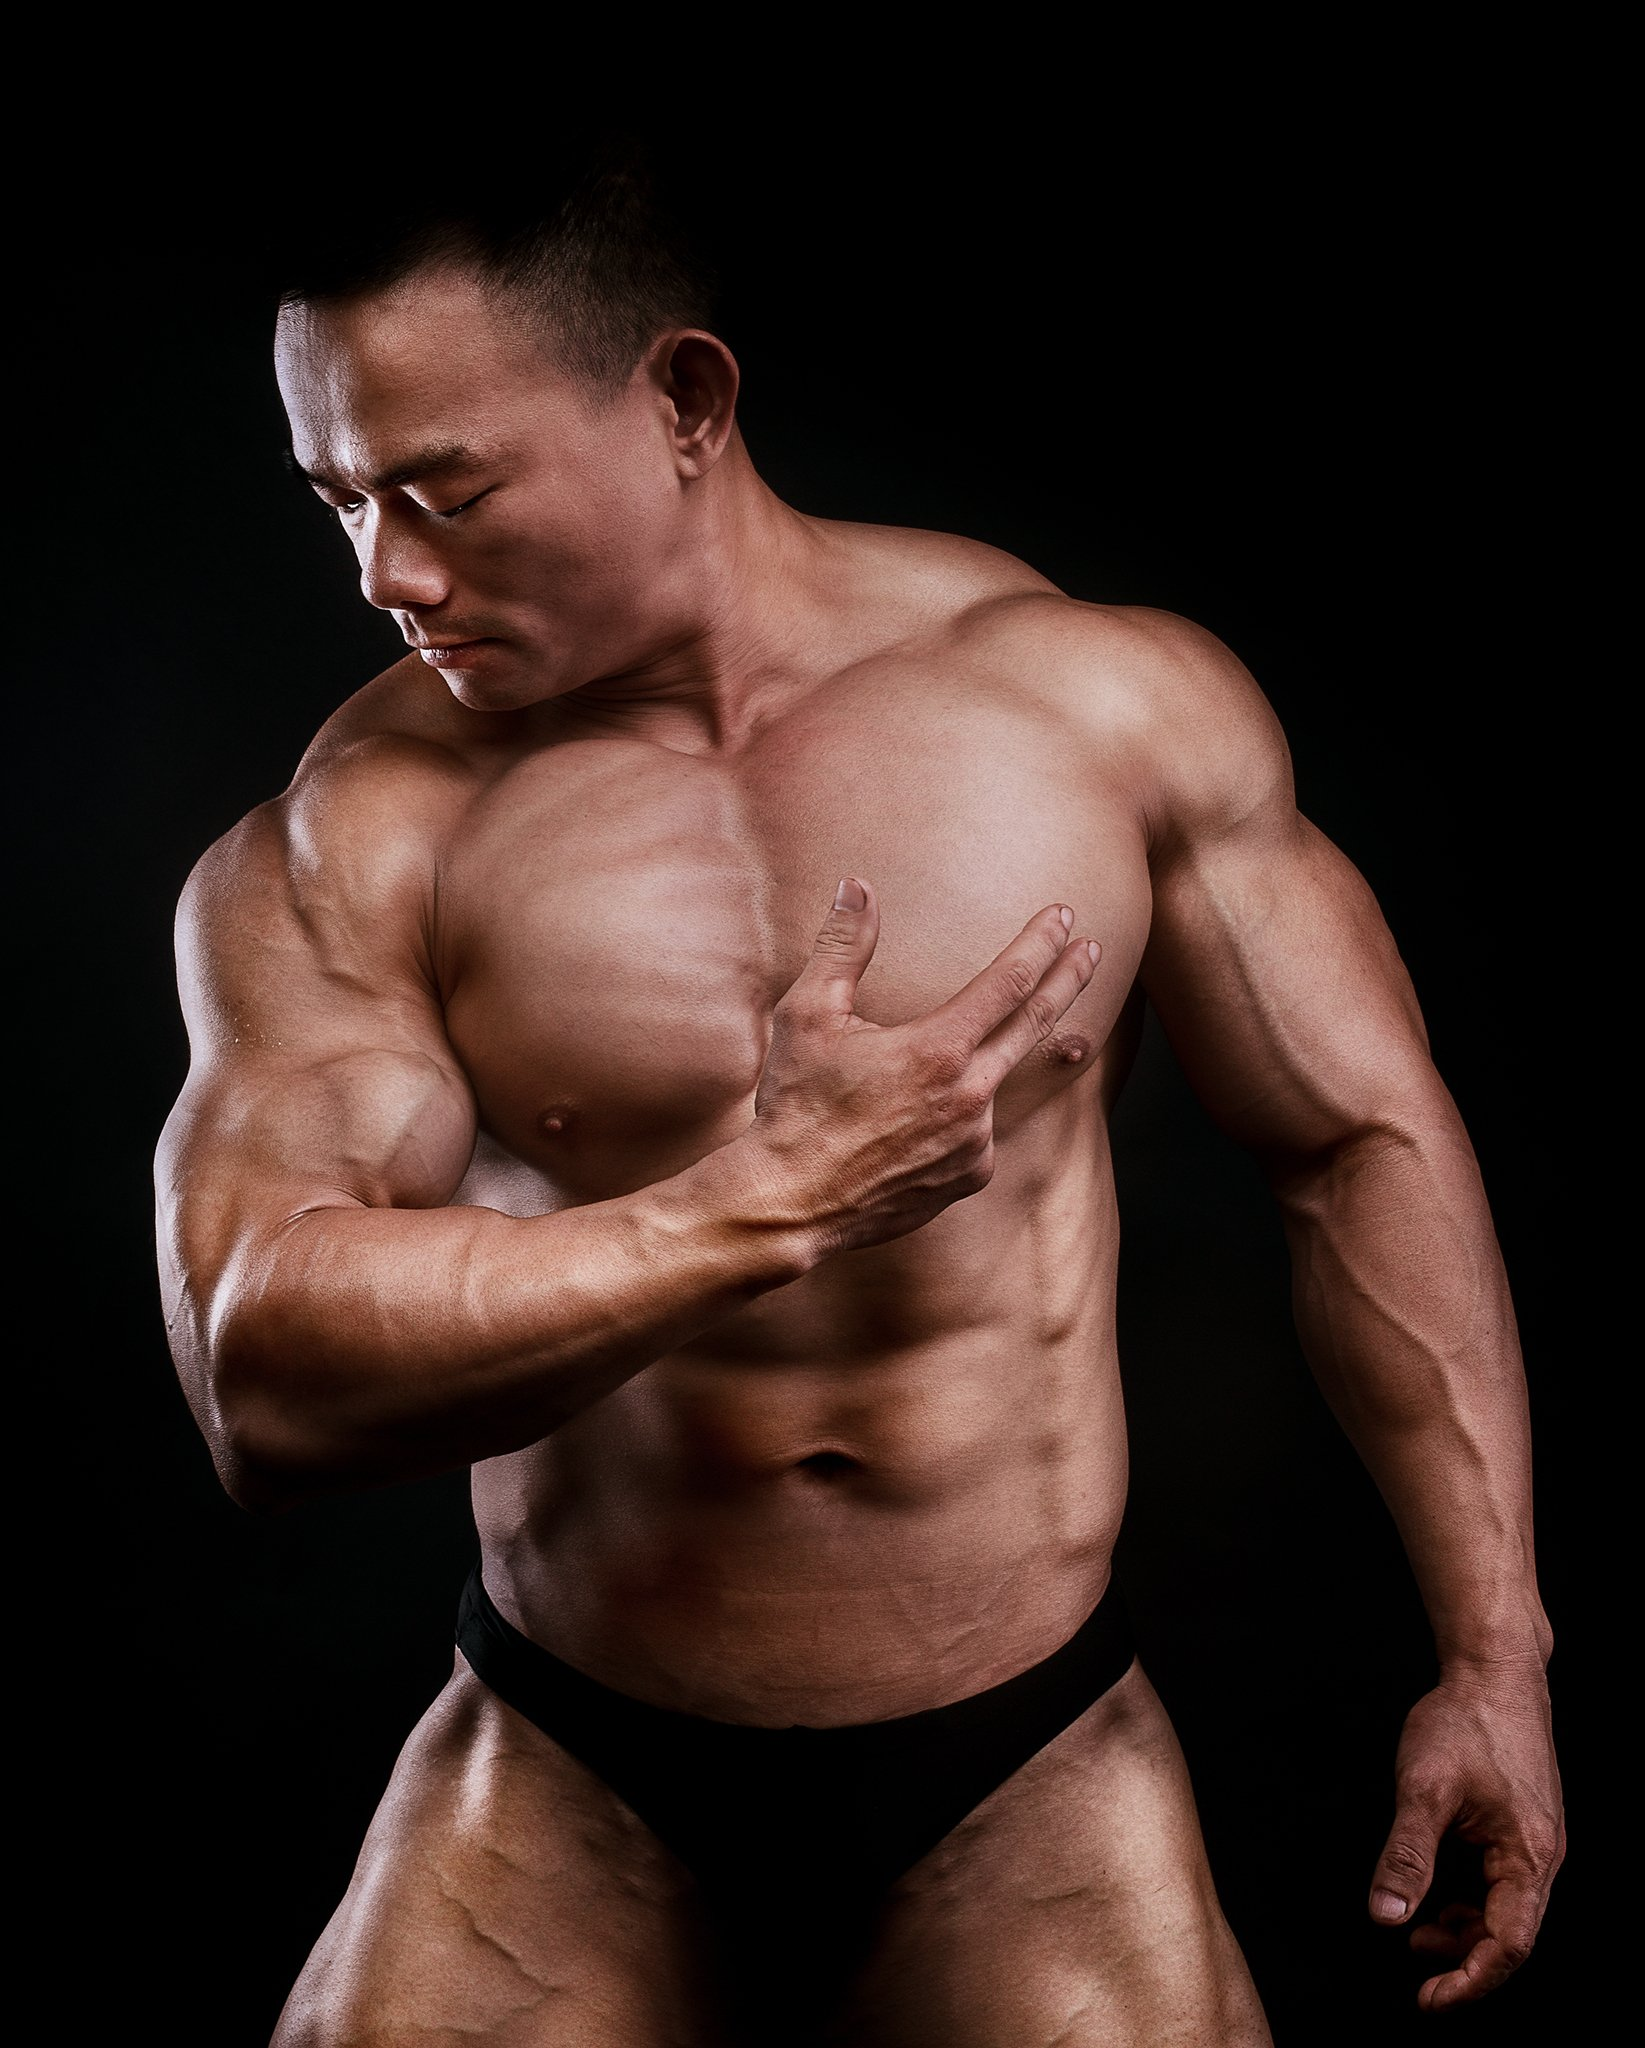 , Nguyen Phong